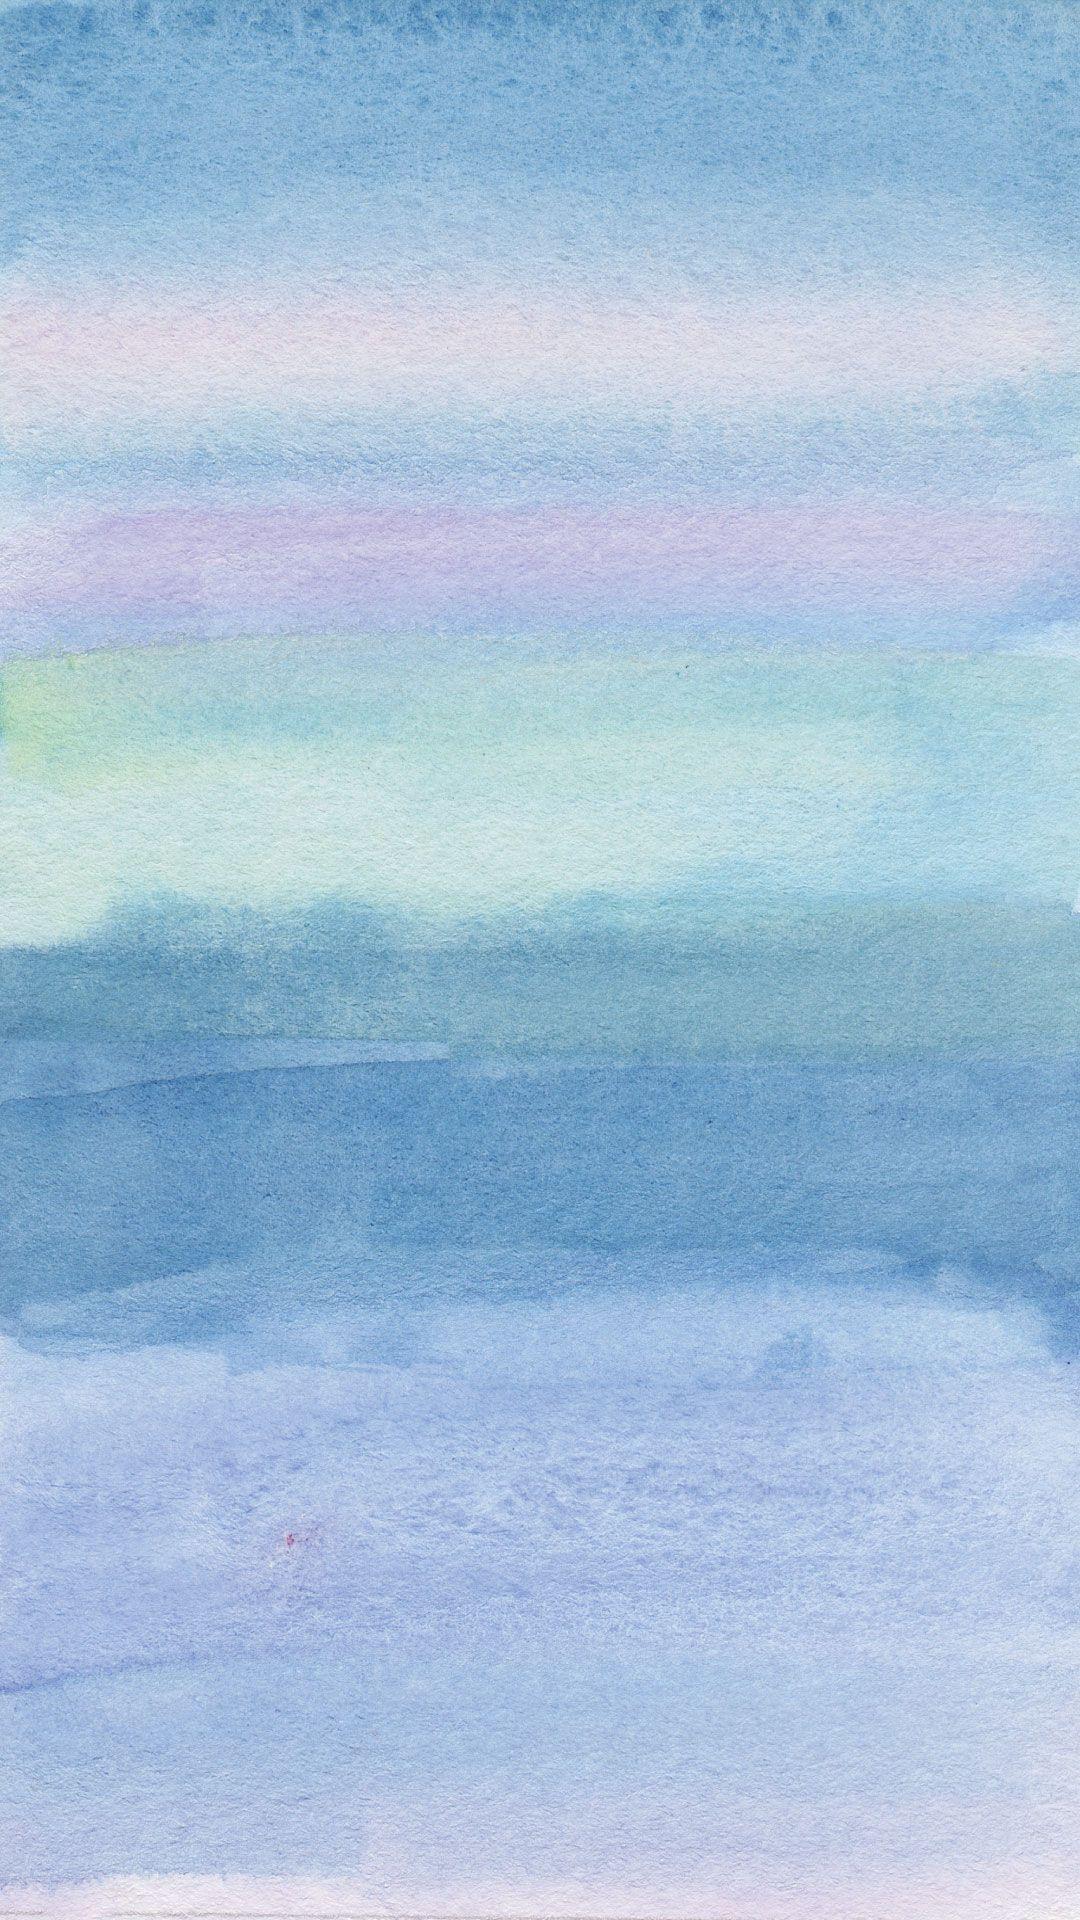 Aesthetic Pastel Ipad Backgrounds